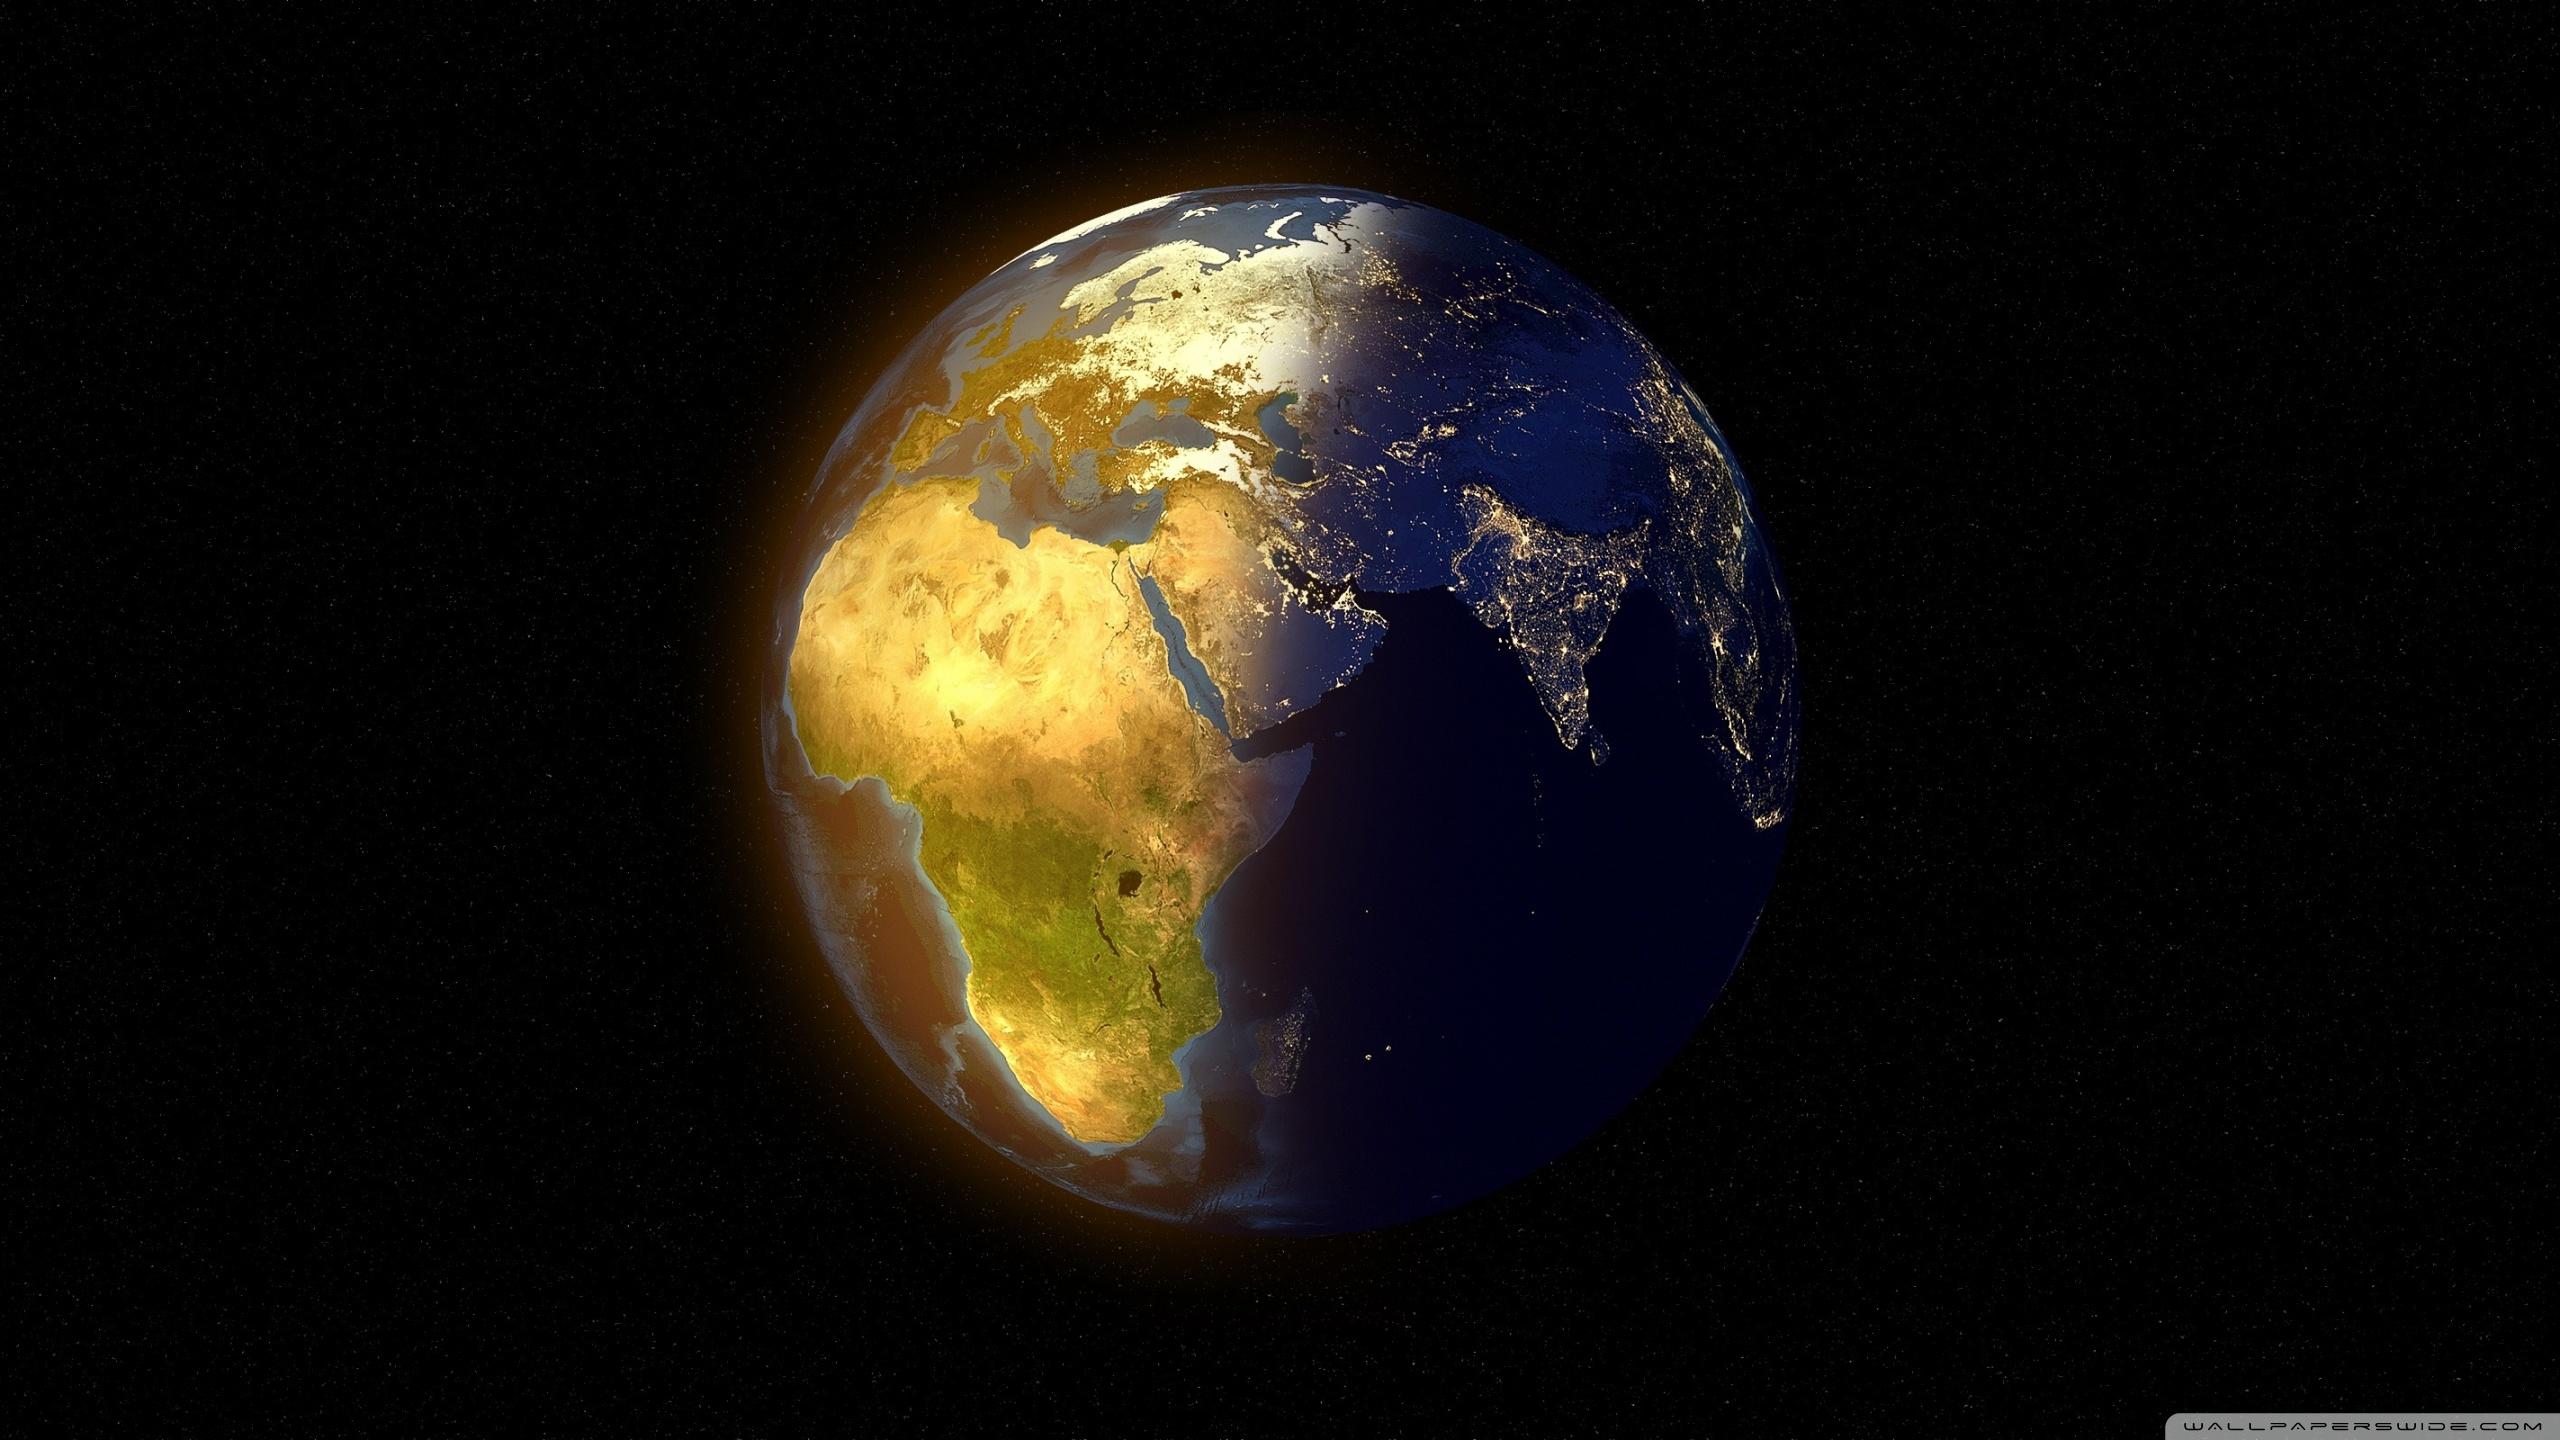 Earth Day and Night 4K HD Desktop Wallpaper for 4K Ultra HD TV 2560x1440